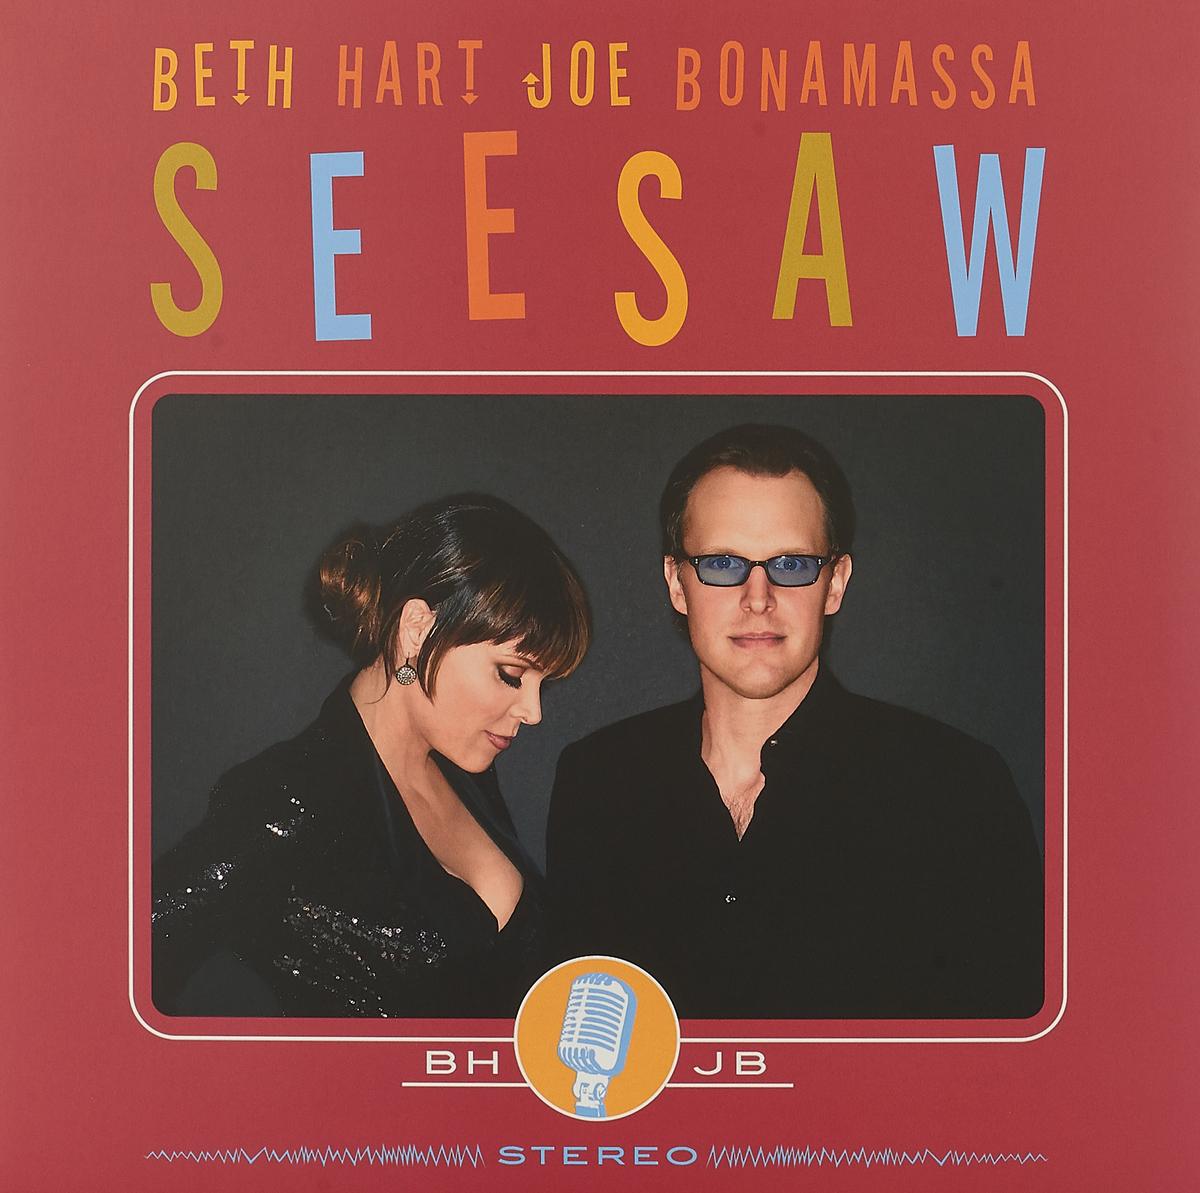 Бет Хат,Джо Бонамасса Beth Hart & Joe Bonamassa. Seesaw (LP) beth hart praha